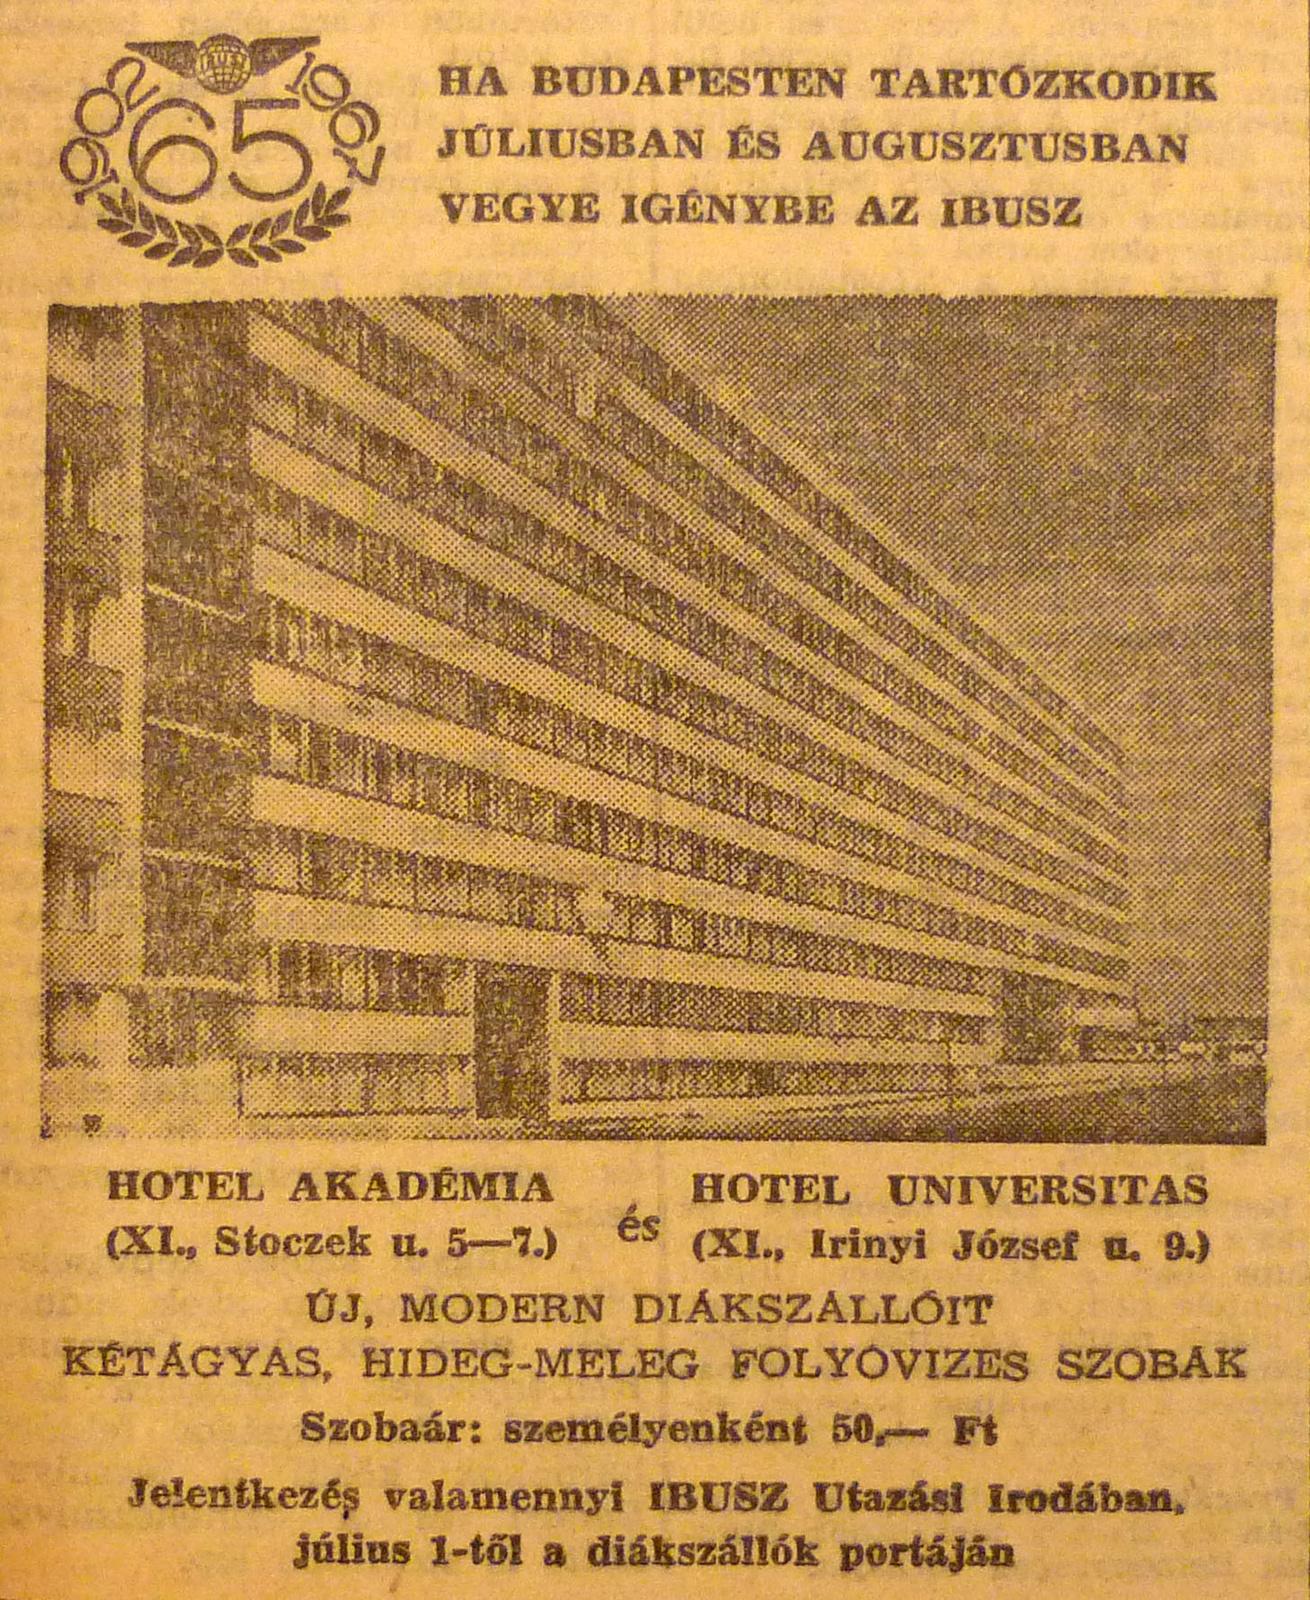 fovarosi.blog.hu: Muegyetem-196707-MagyarNemzetHirdetes - indafoto.hu